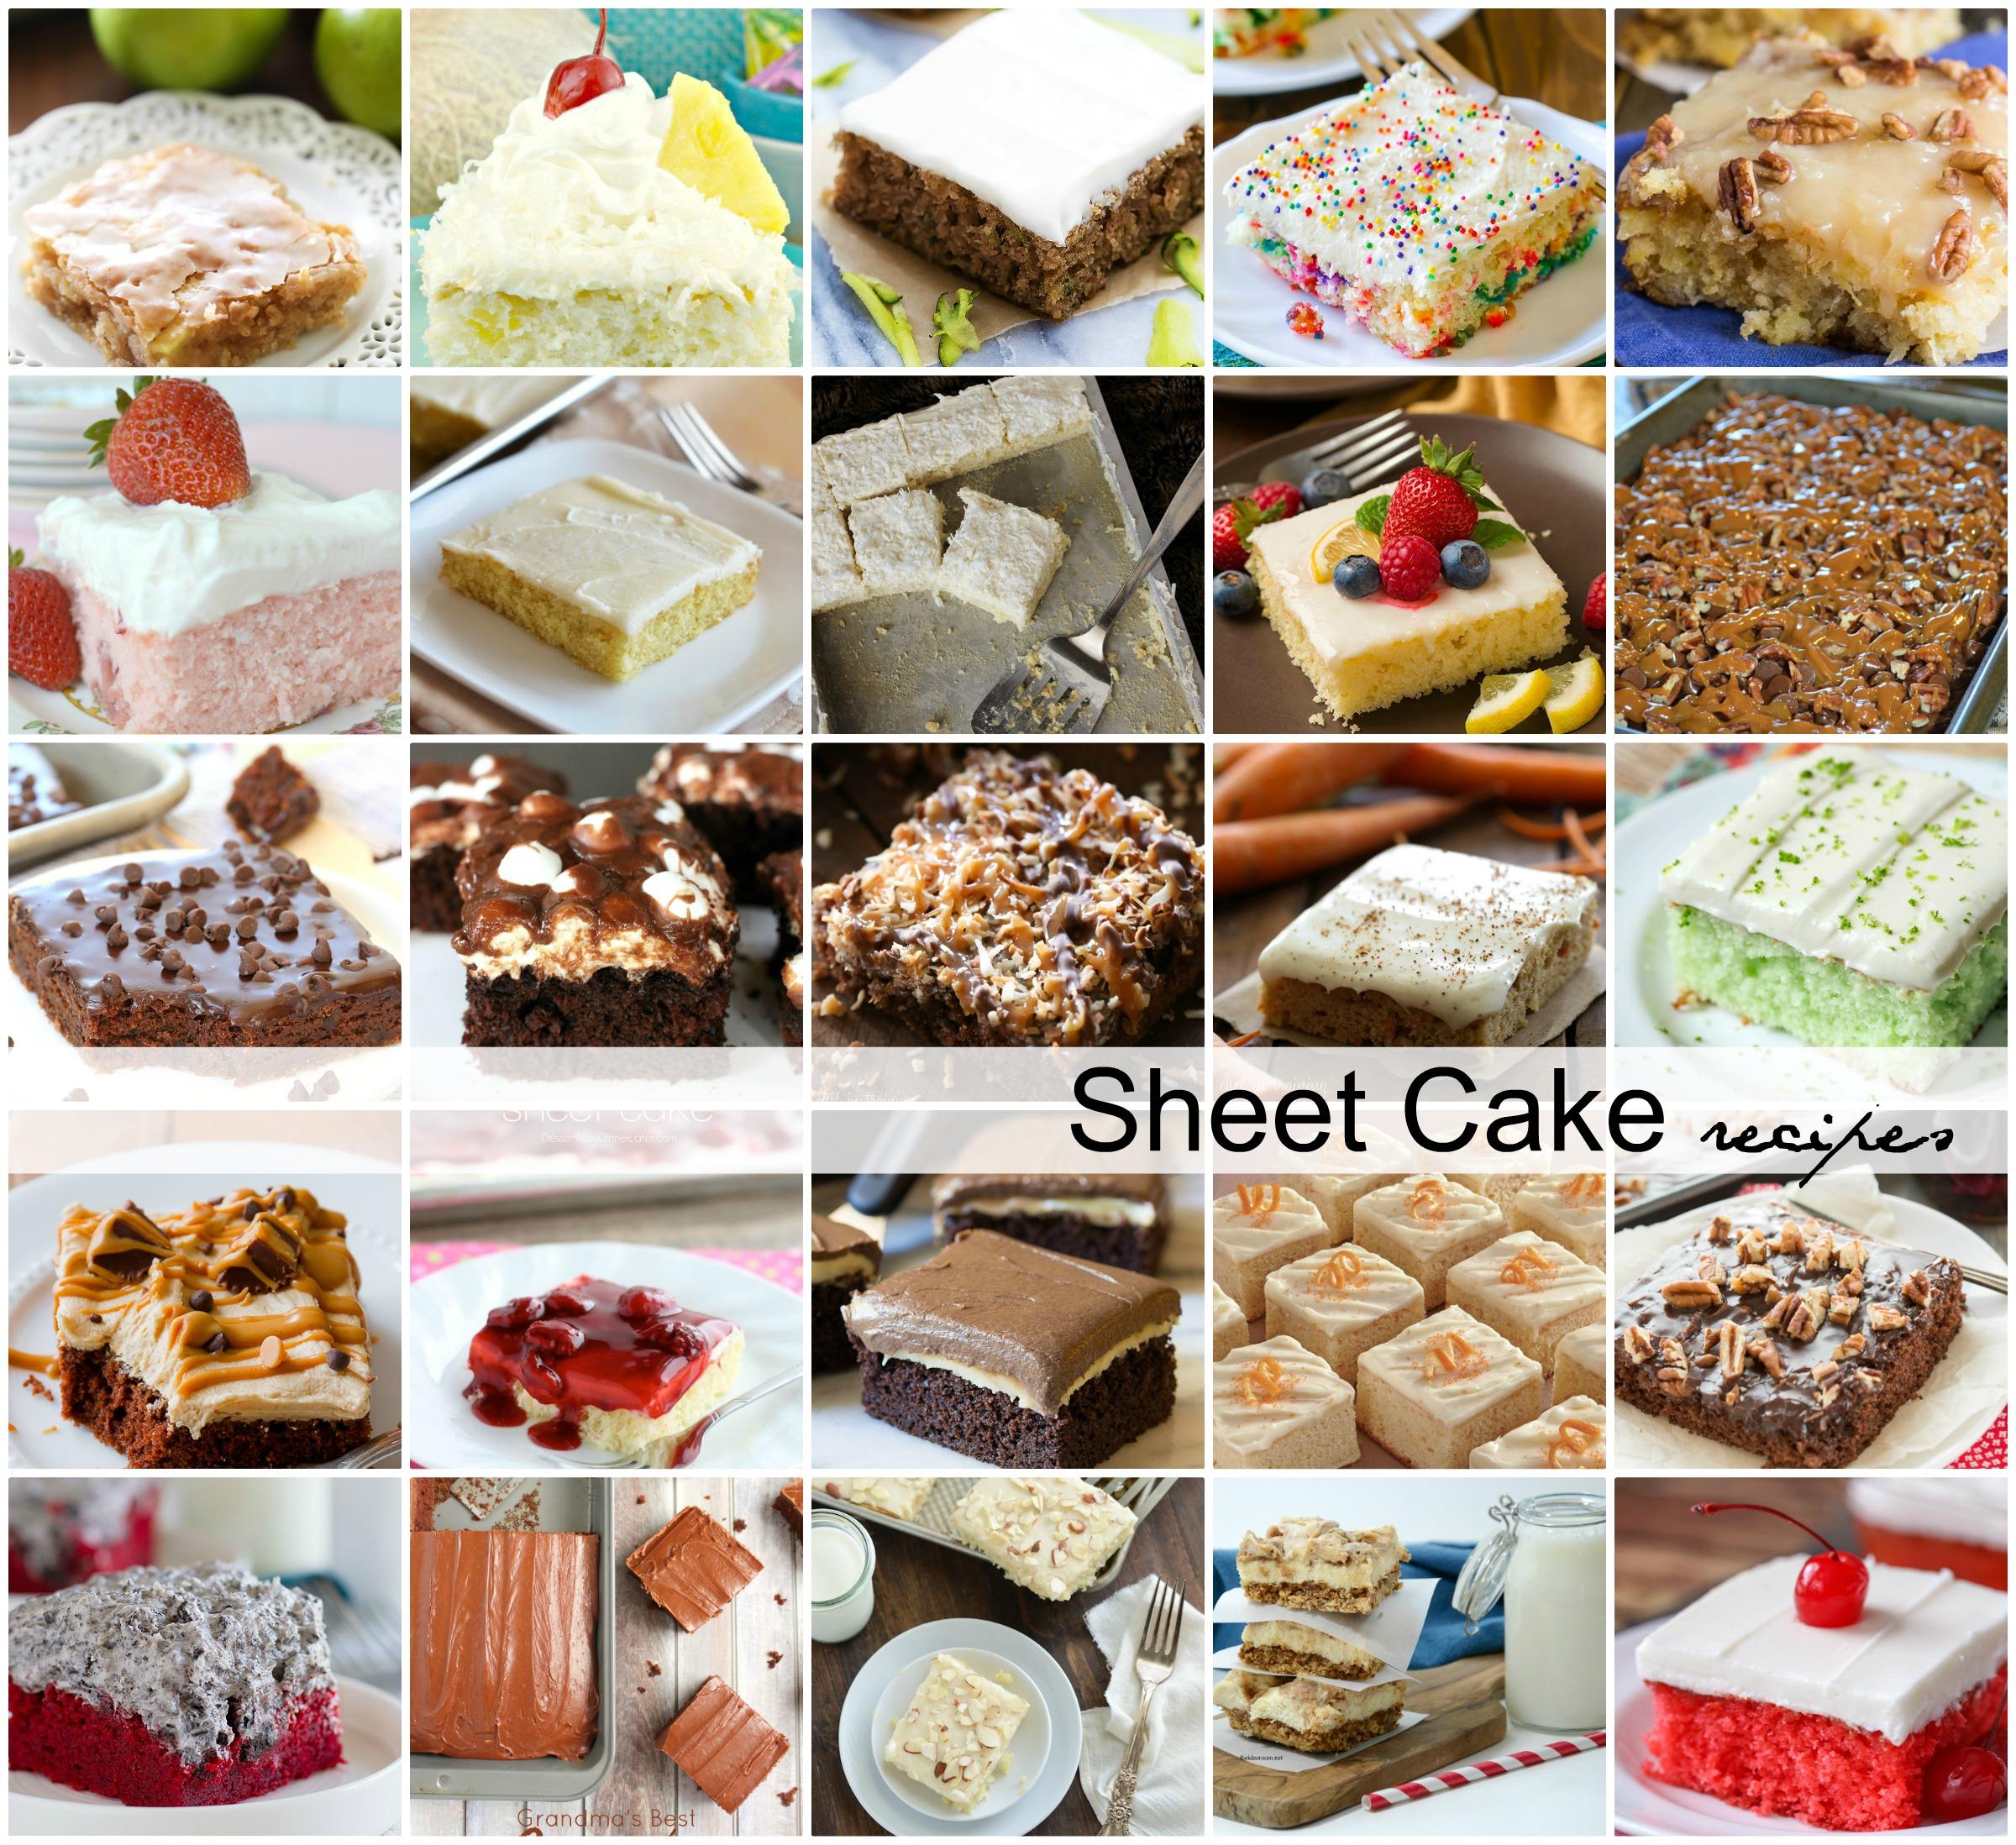 Sheet-Cake-Recipes-Dessert-1